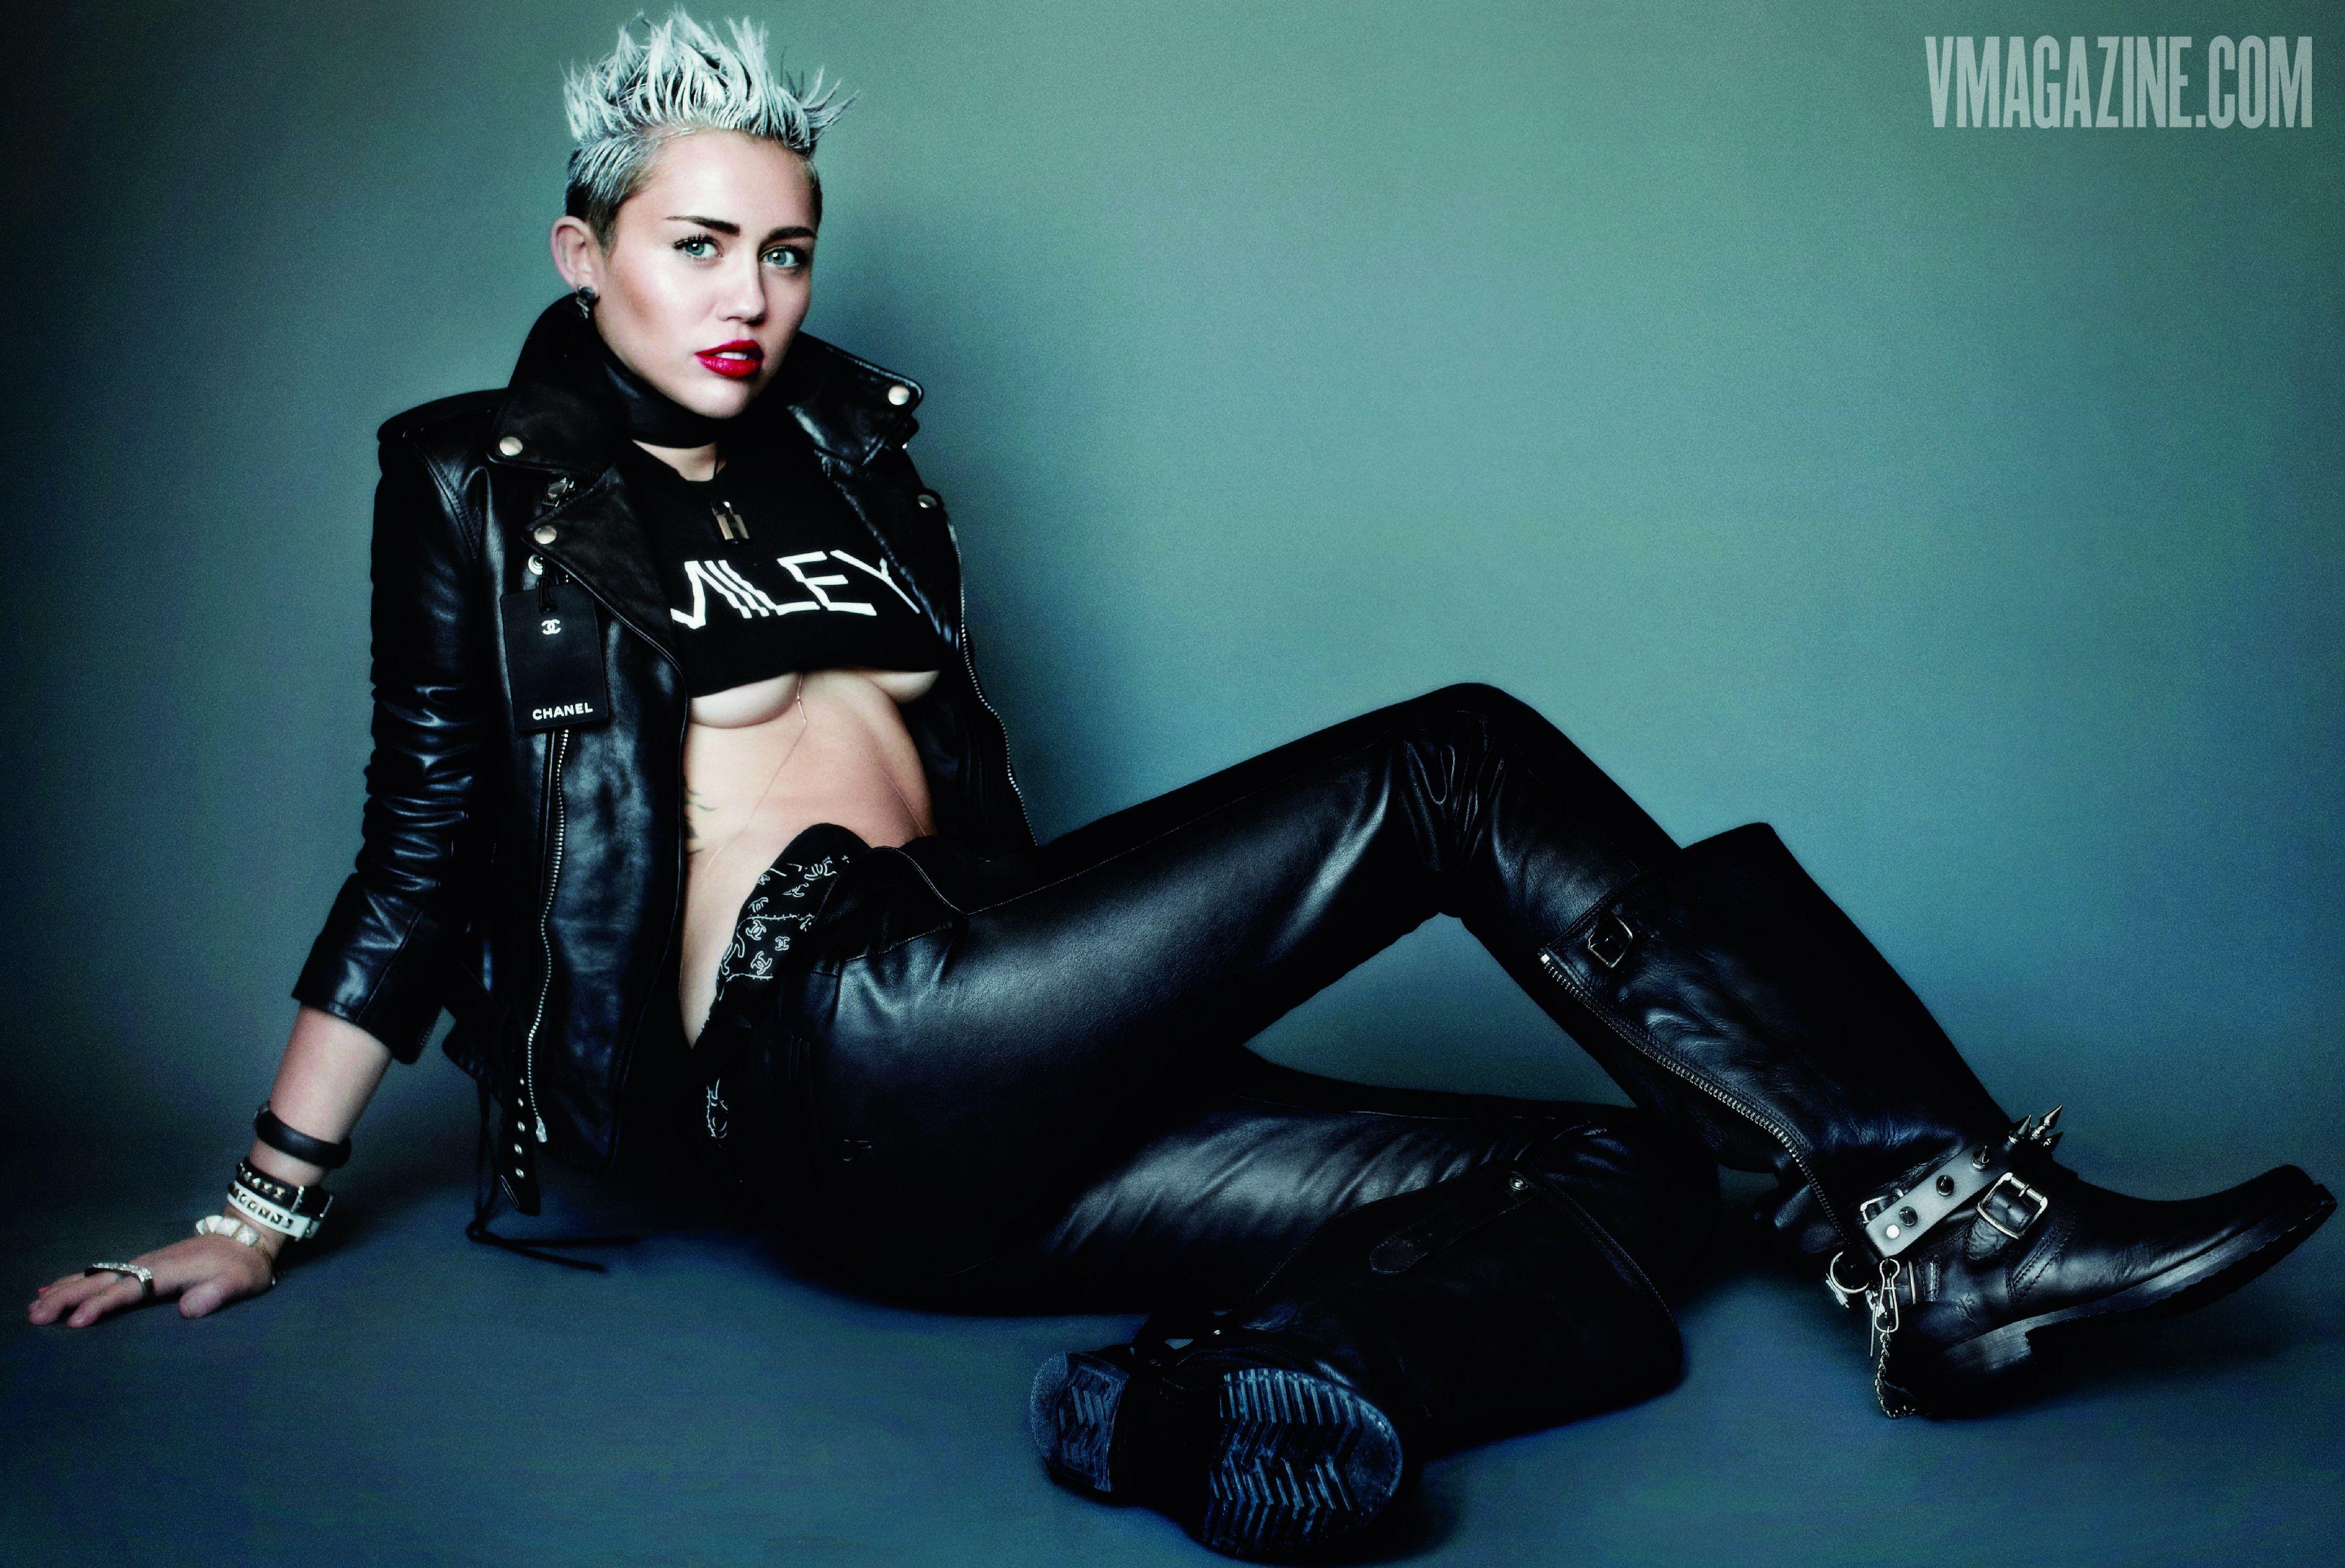 Miley Cyrus by Mario Testino for V Magazine Style Miley Cyrus .mx